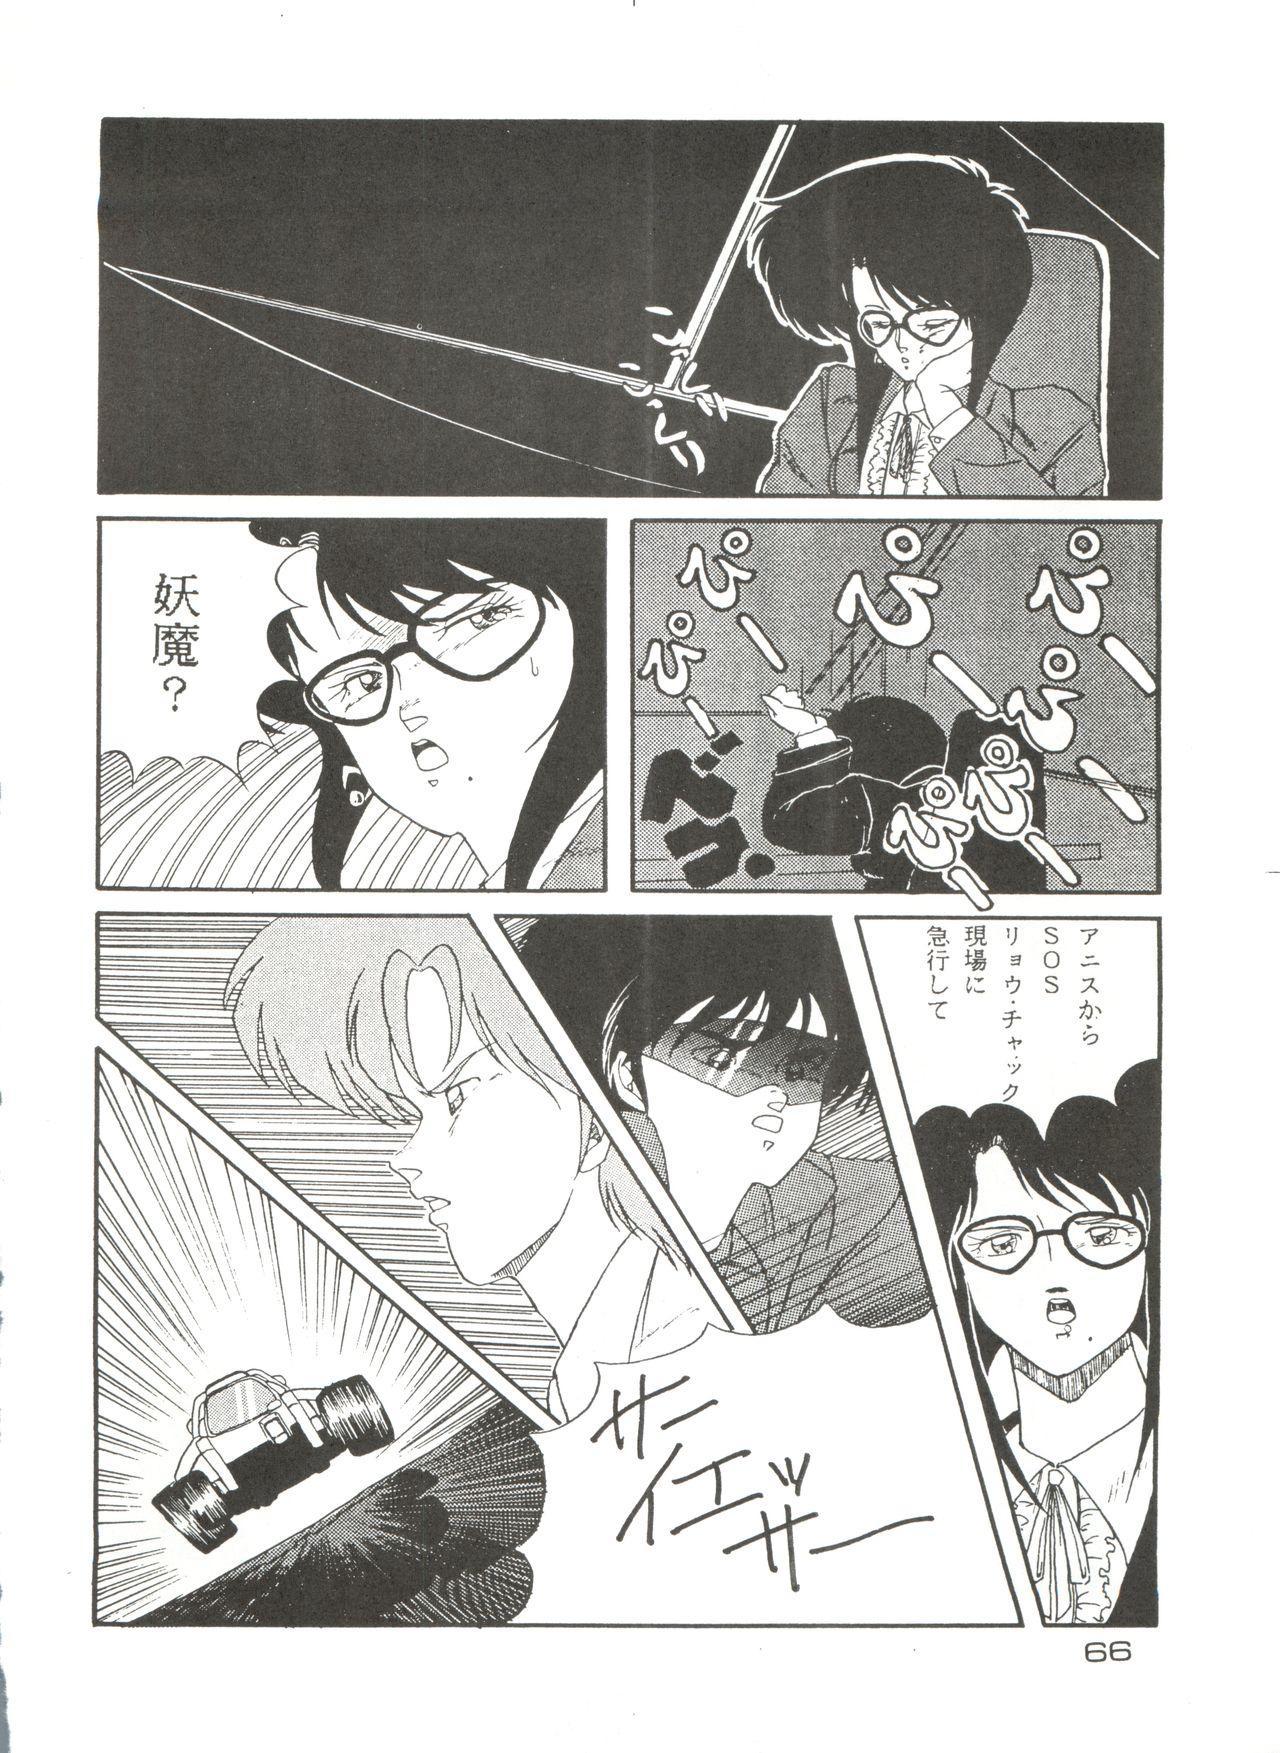 [Studio Fuck (Various) Onapet 7 (Sonic Soldier Borgman, Gundam ZZ, Osomatsu-kun) 65